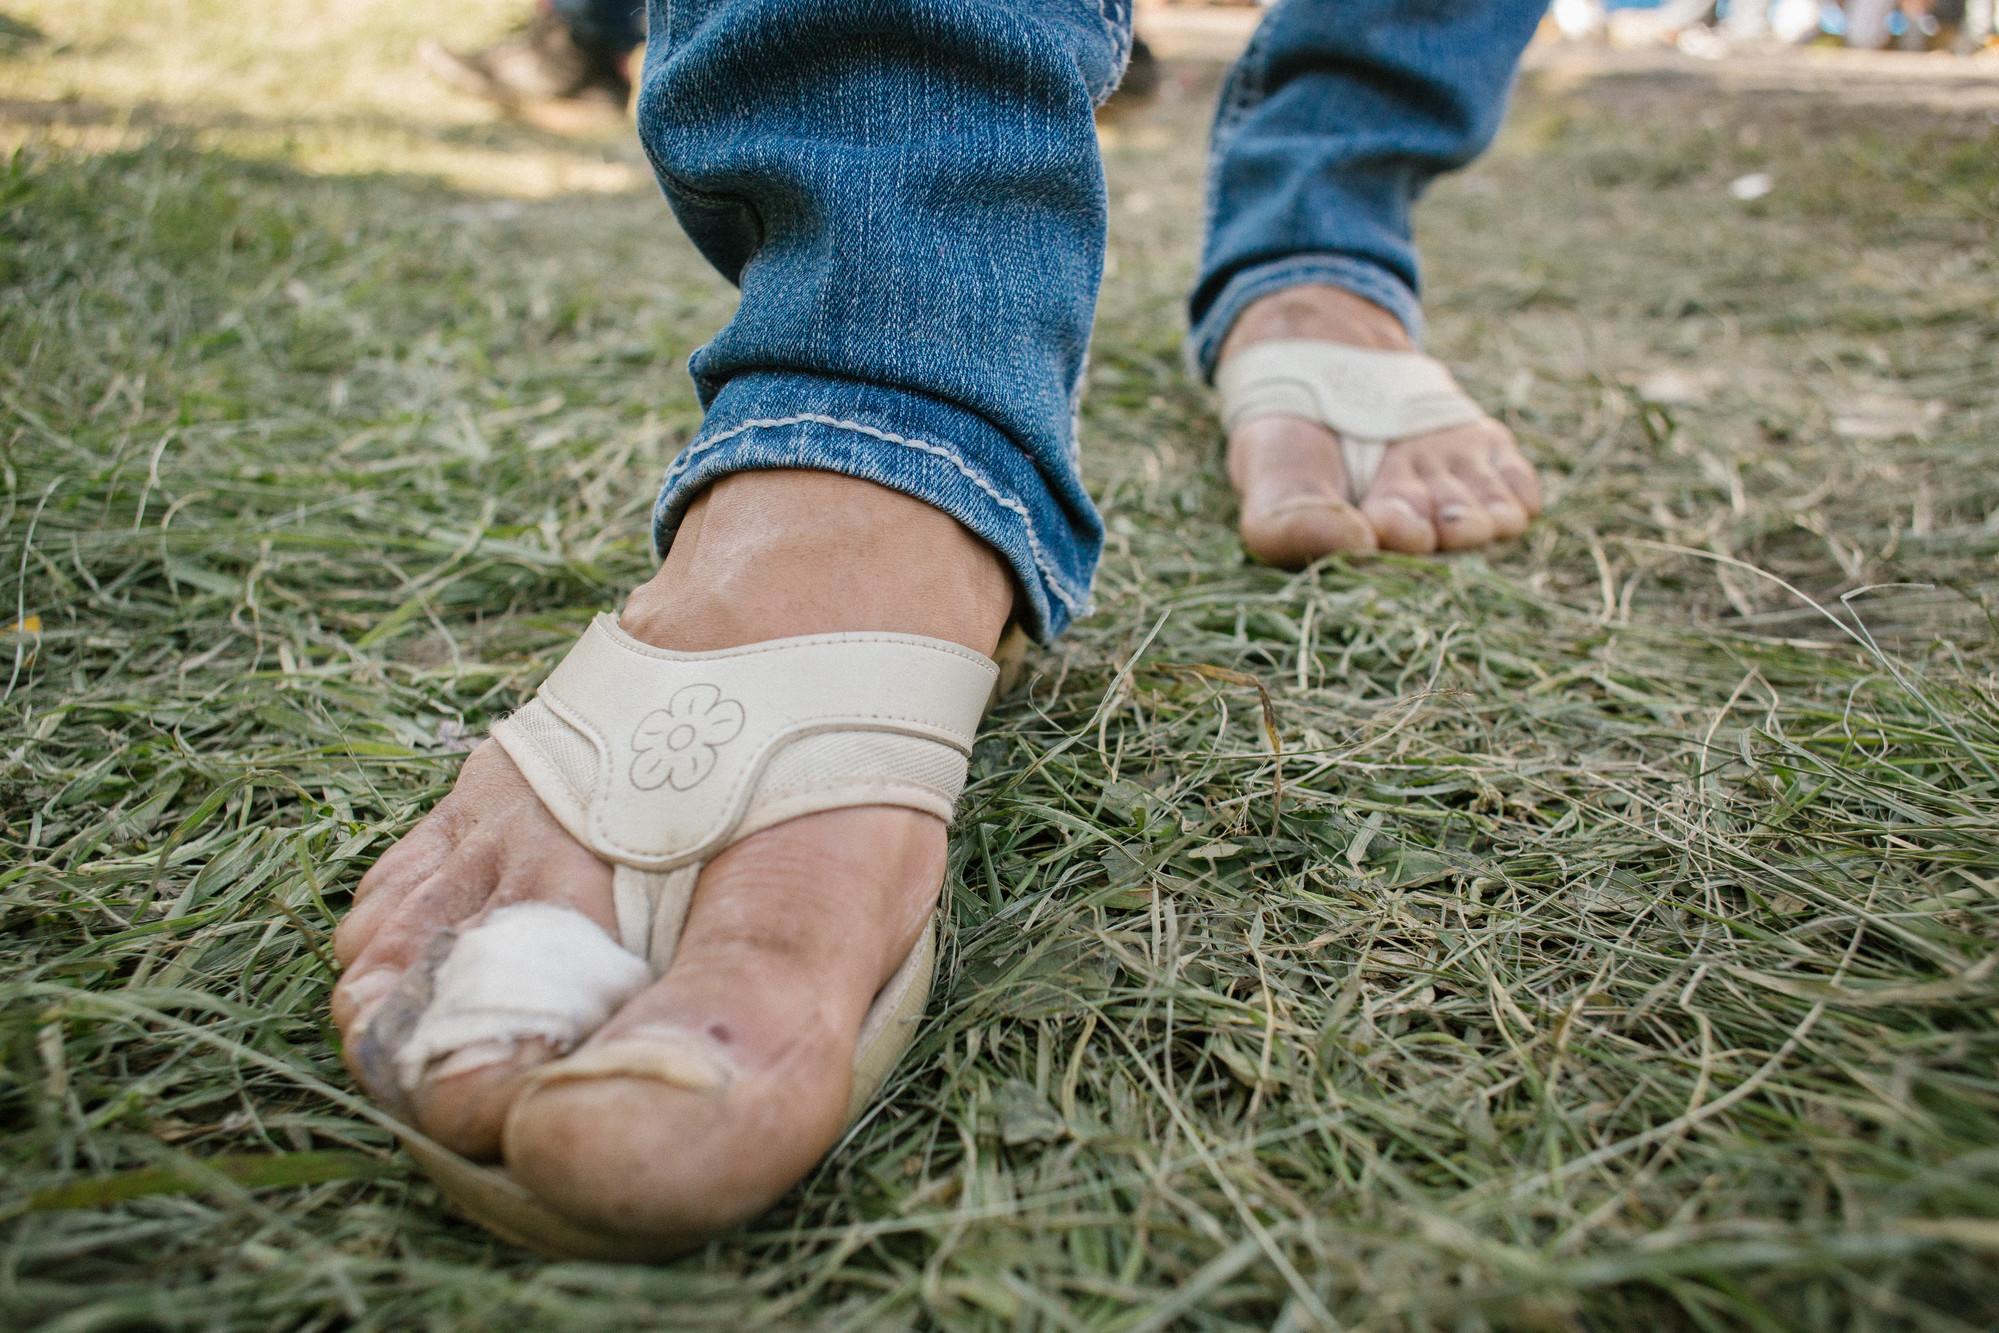 Lorenas Feet | © Sergio Ortiz/Amnesty International